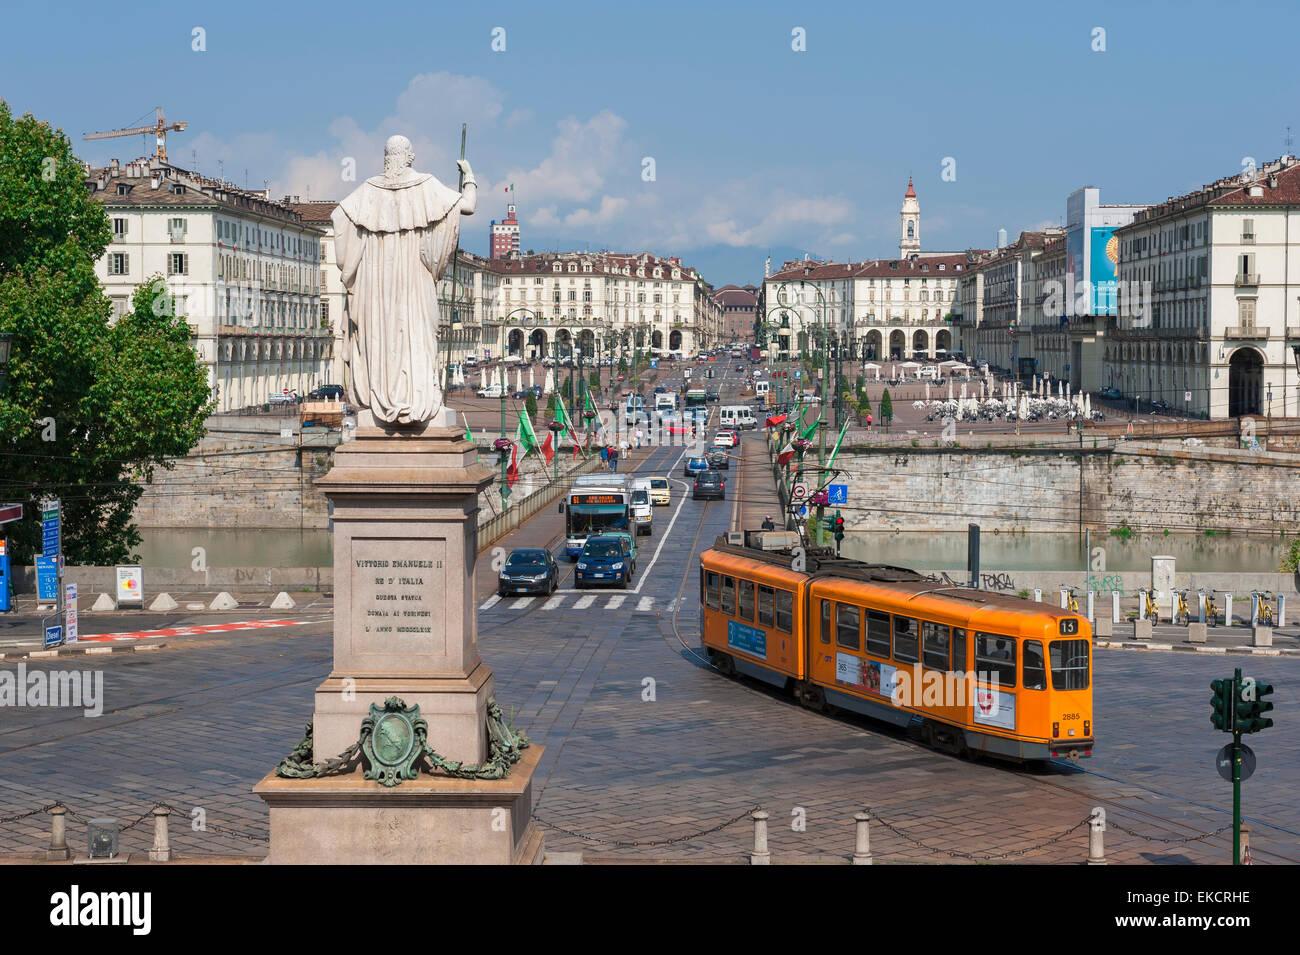 Turin city center ,view across the Ponte Vittorio Emanuele towards the Piazza Vittorio Veneto in the centre of Turin - Stock Image